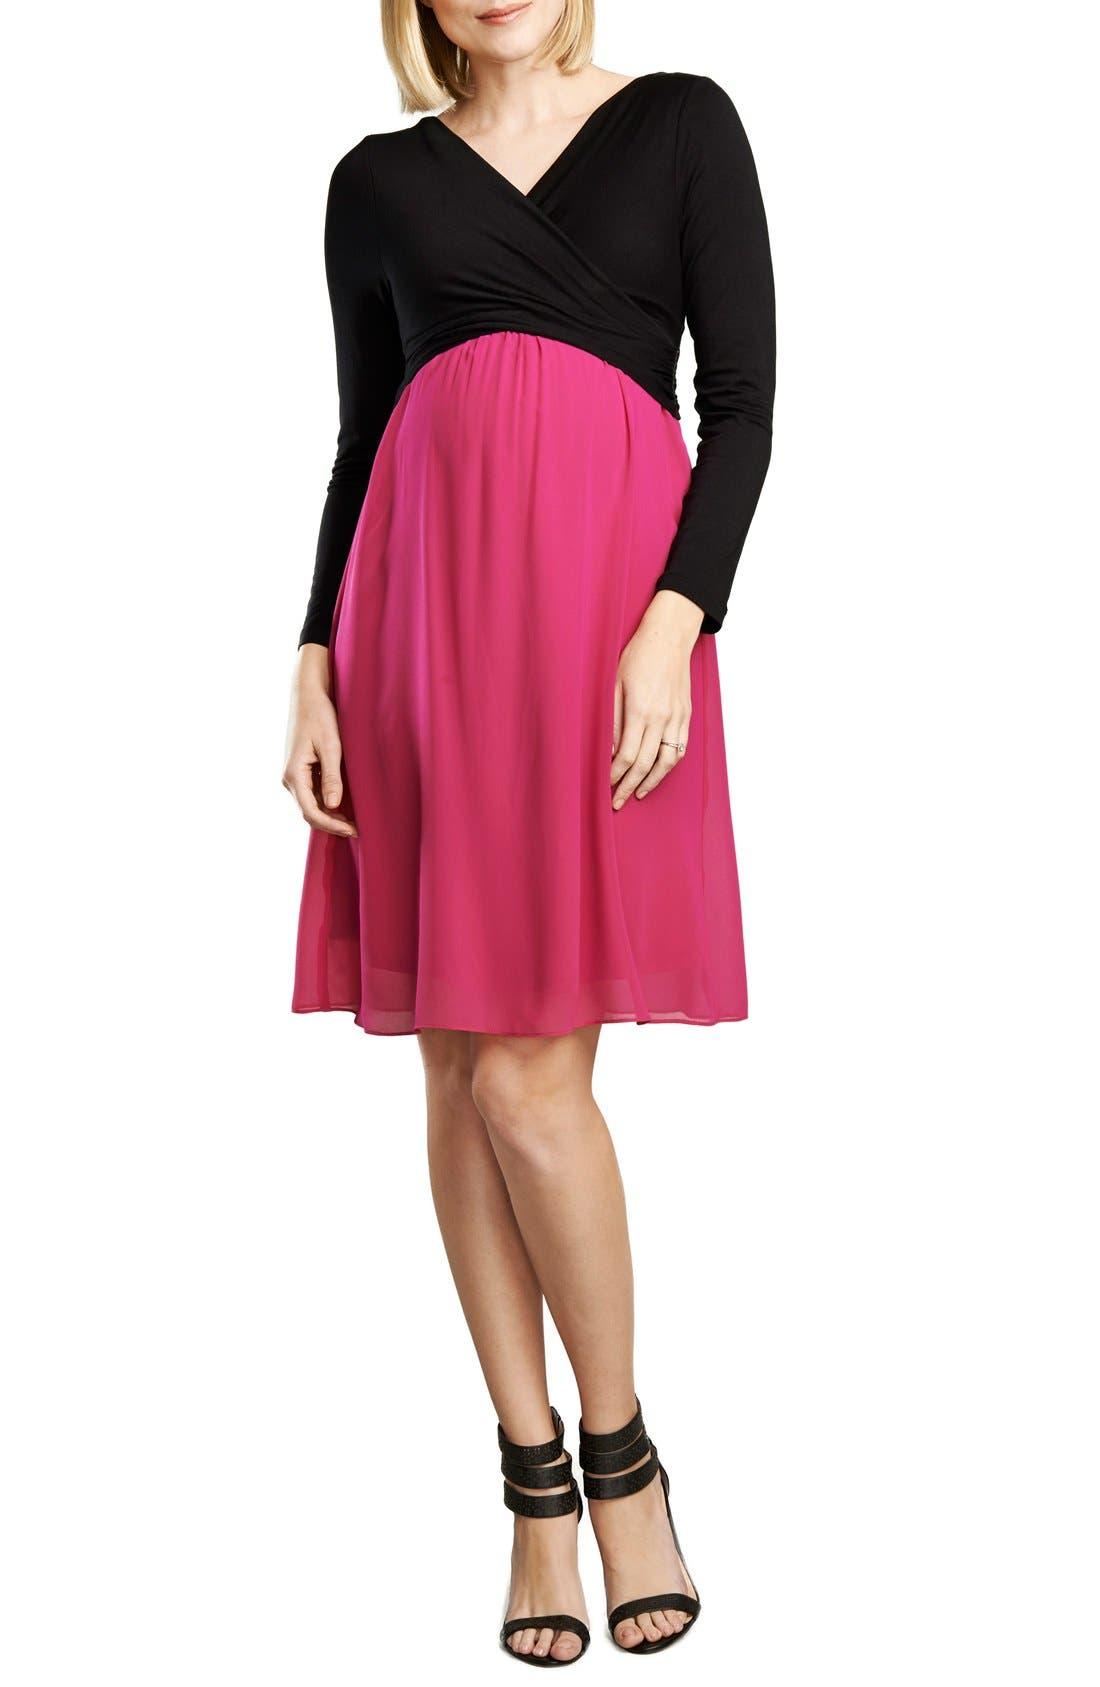 Maternal America Crossover Maternity Dress, Pink